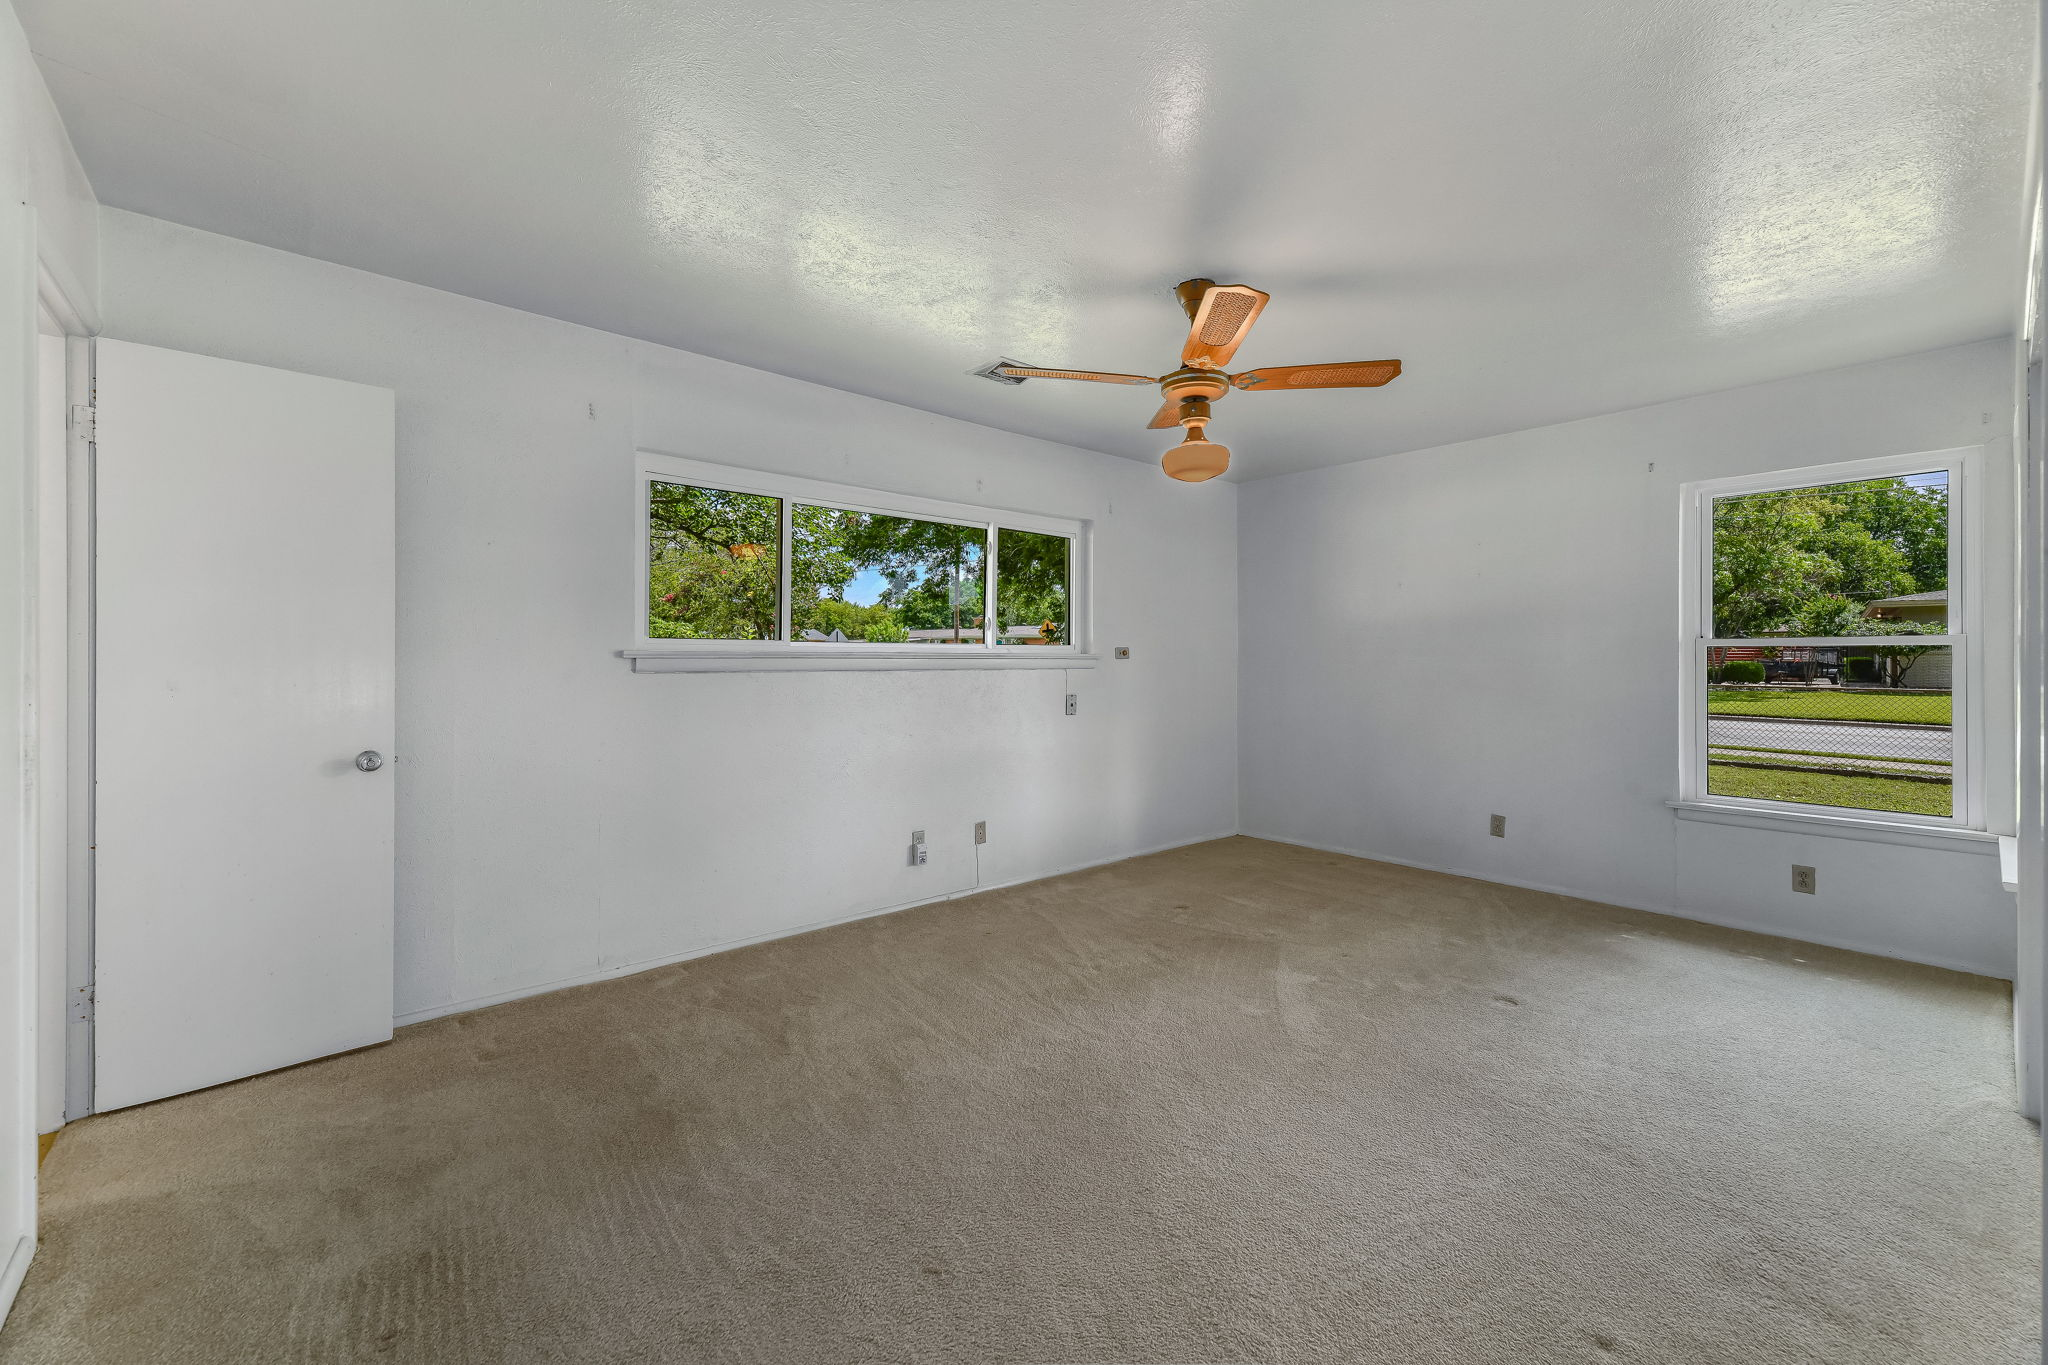 018-Bedroom 2-FULL